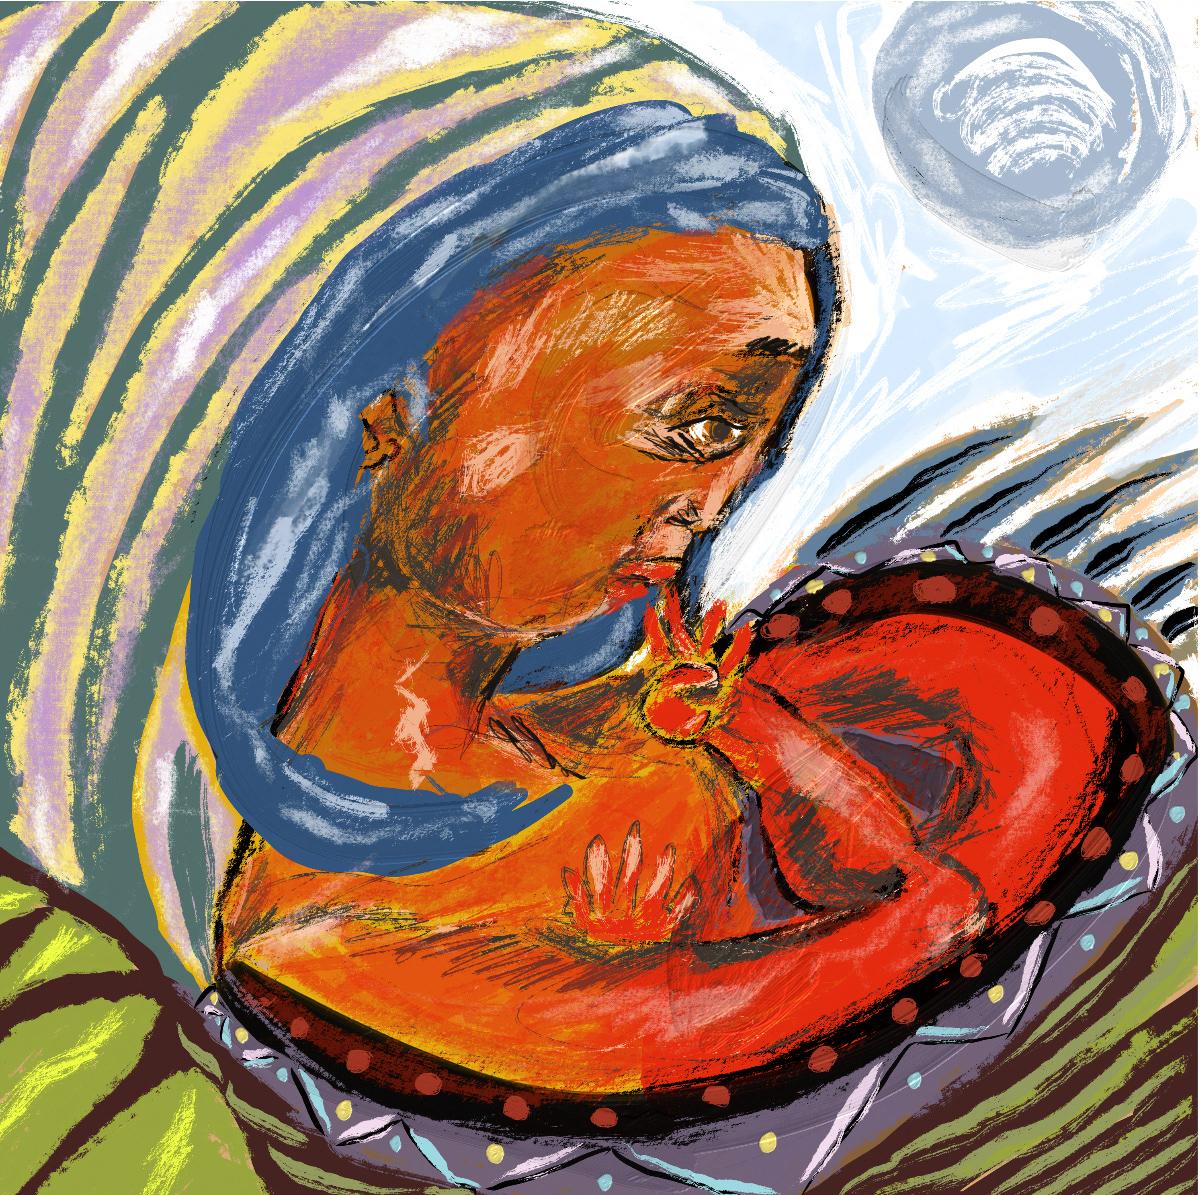 Zeichnung AdobeProjectGemini adobe fresco